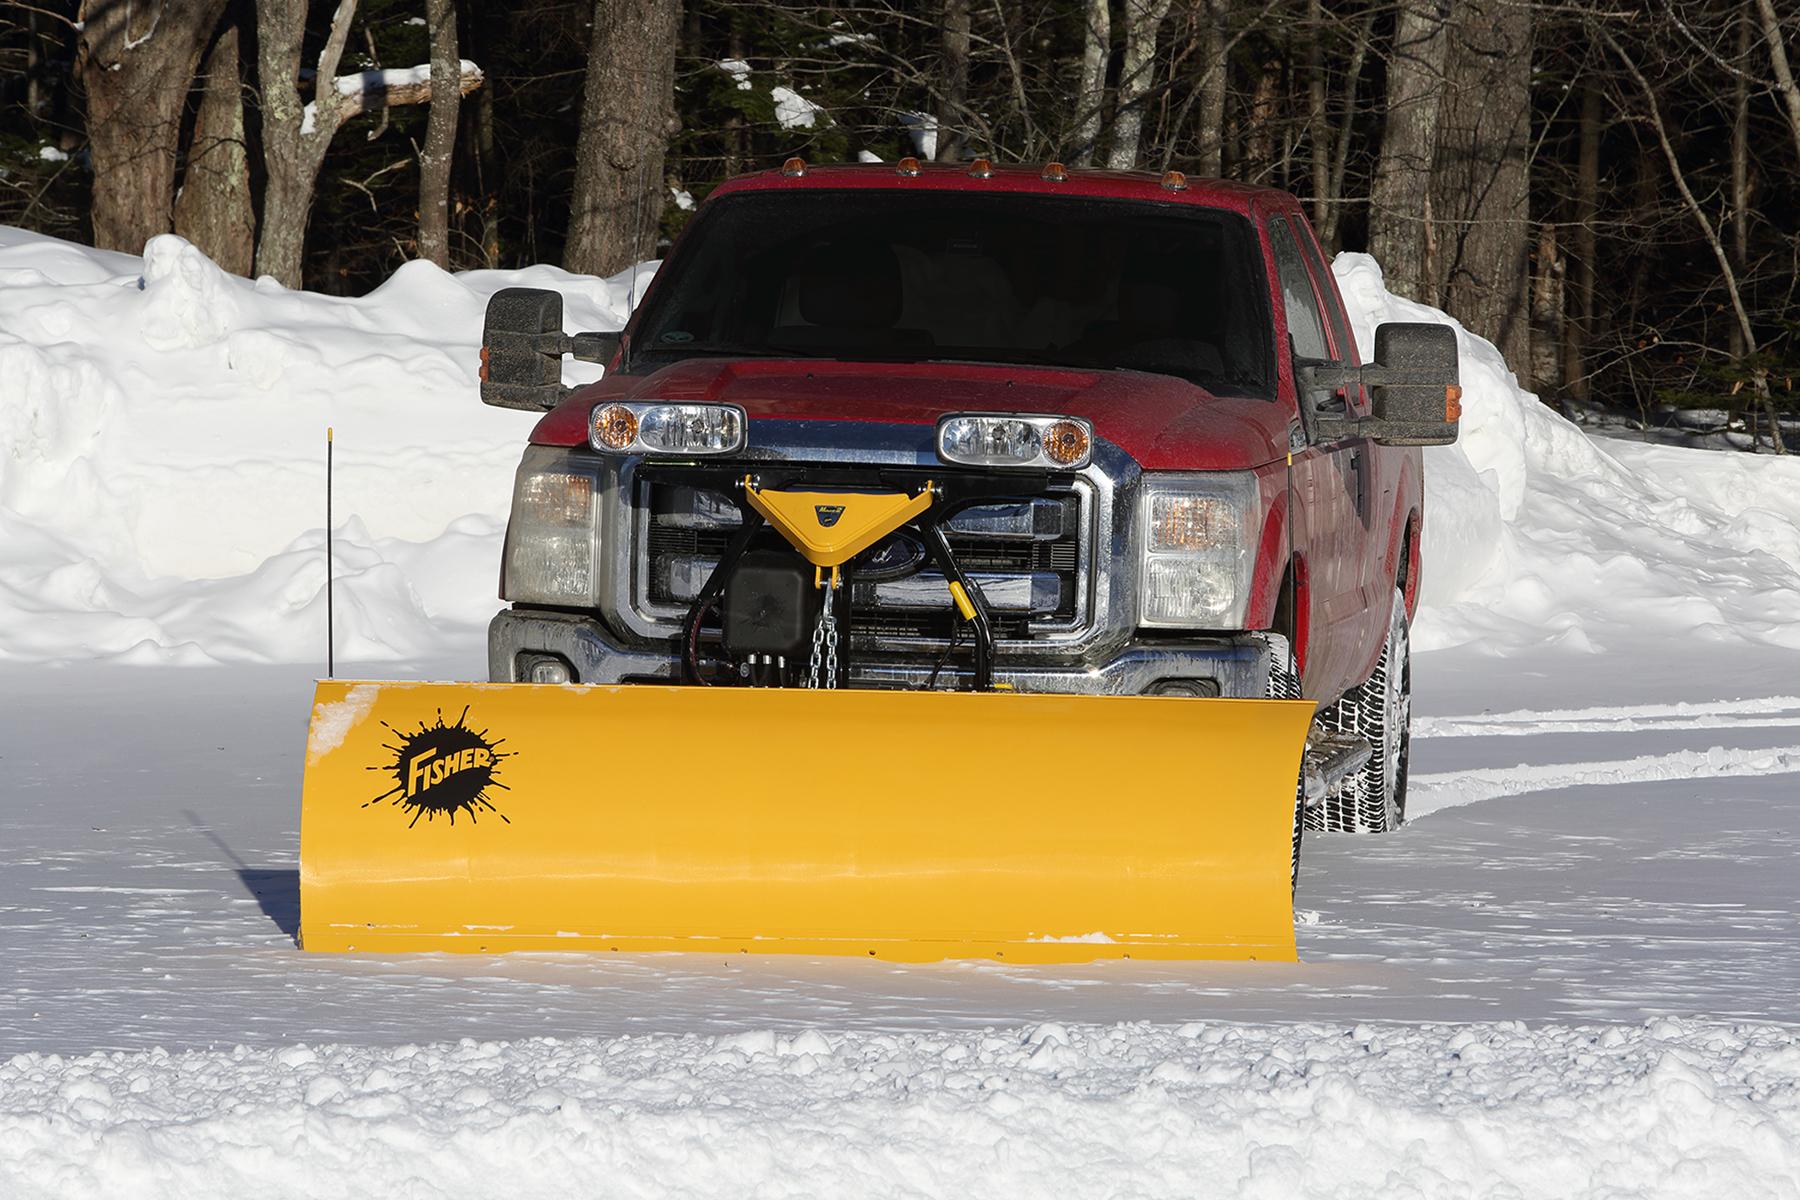 western plow 2000 honda accord parts diagram hd series snow nj snowplows and fisher